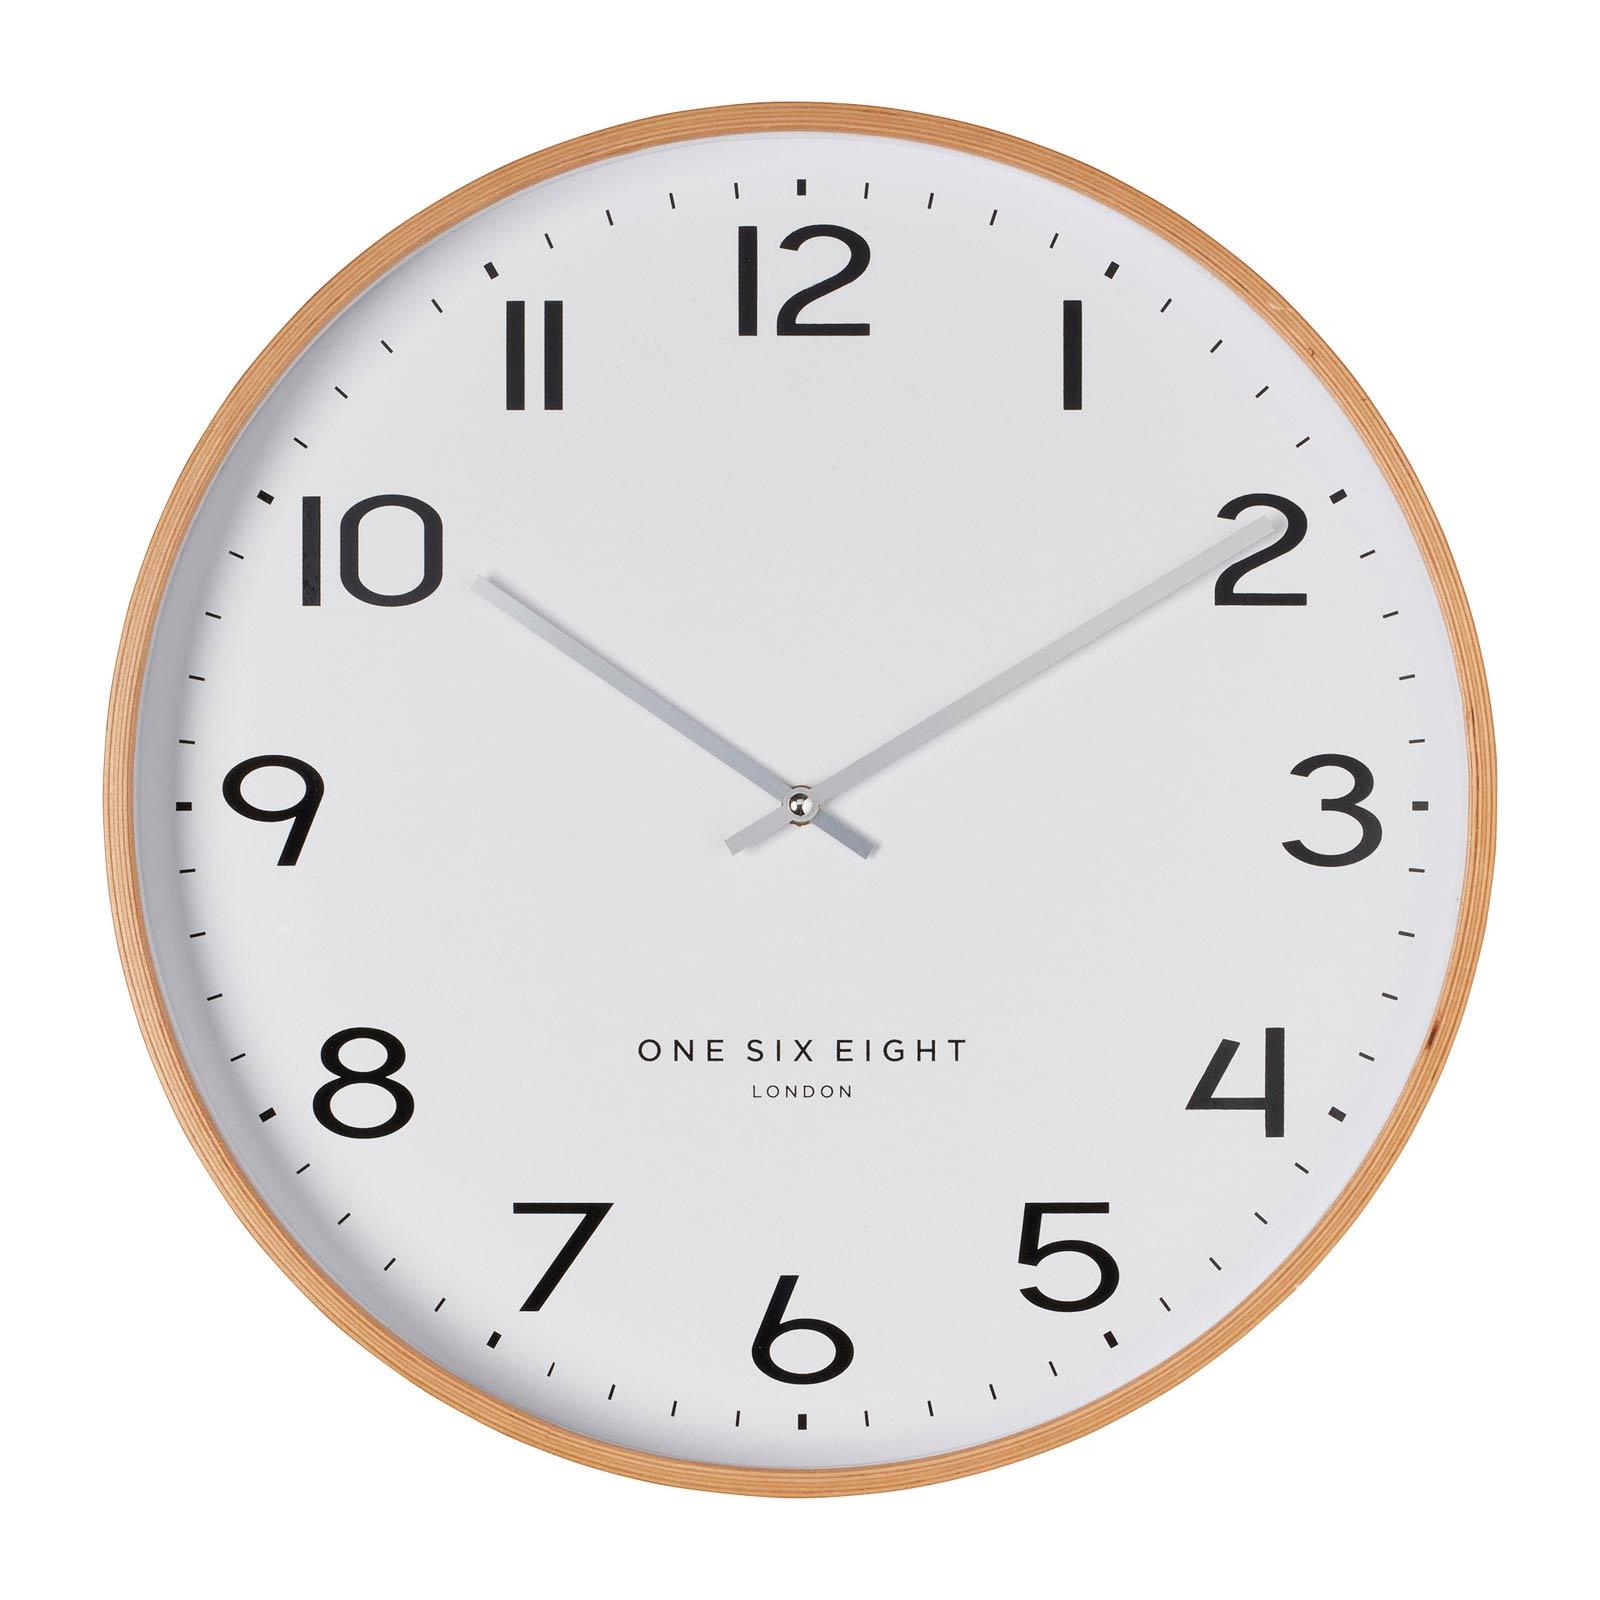 ONE SIX EIGHT LONDON silent wall clock OLIVIA white - Ø 41 x 4.5 cm | the design gift shop